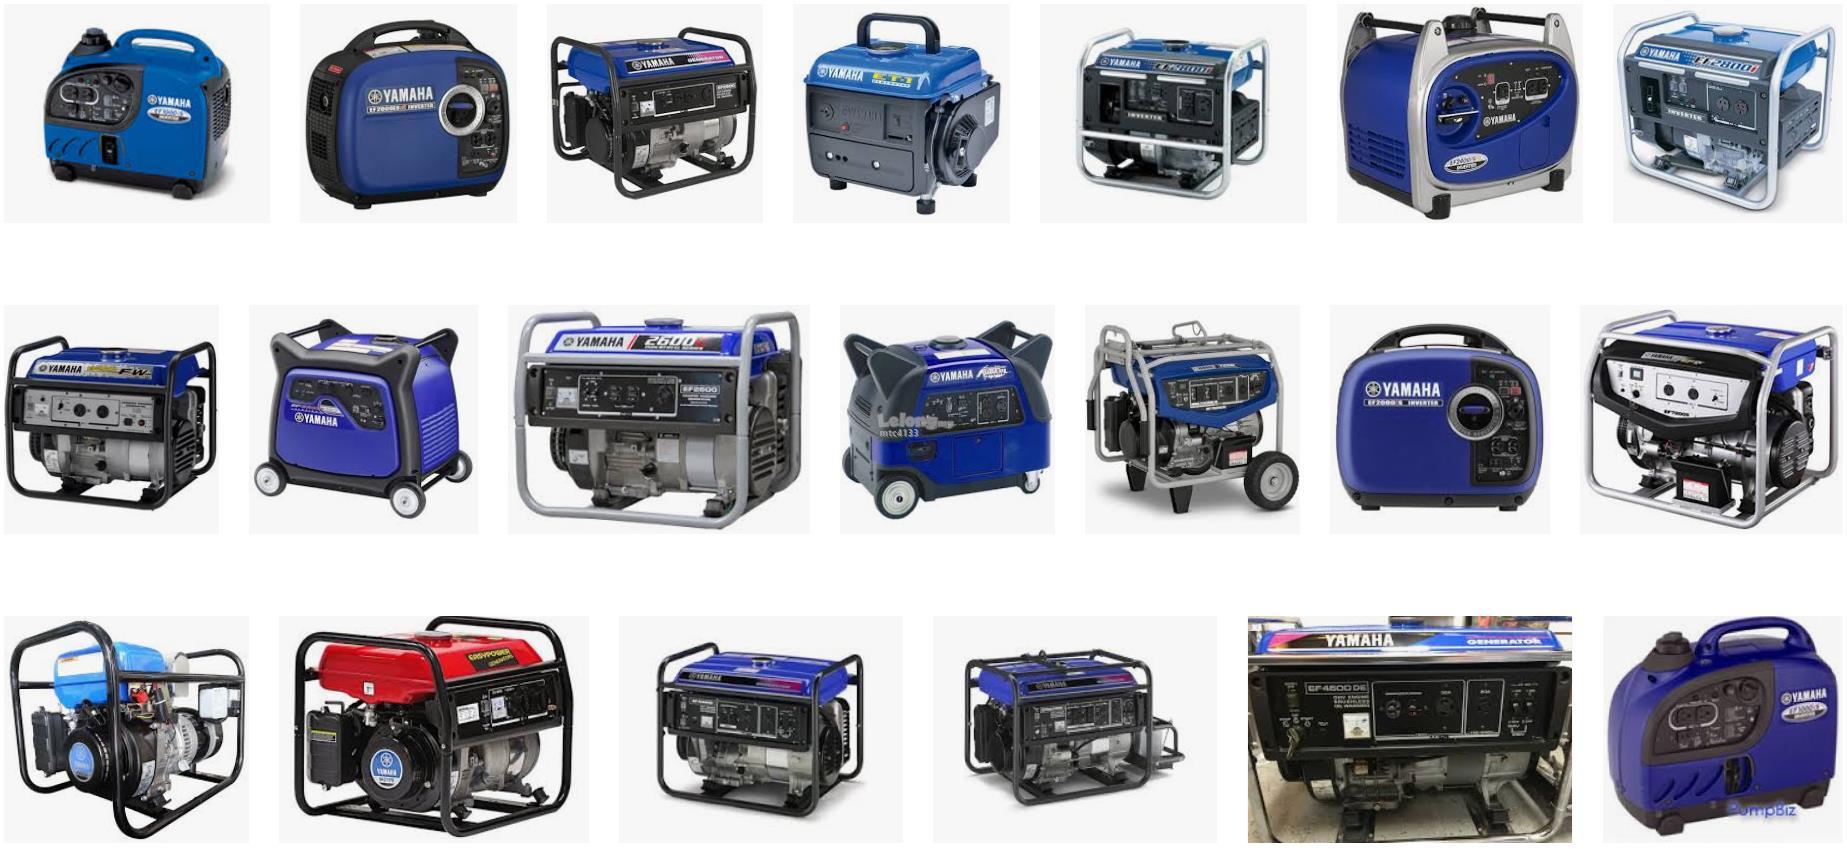 Yamaha electric Portable fuel engine (end 11/6/2020 1:15 PM)